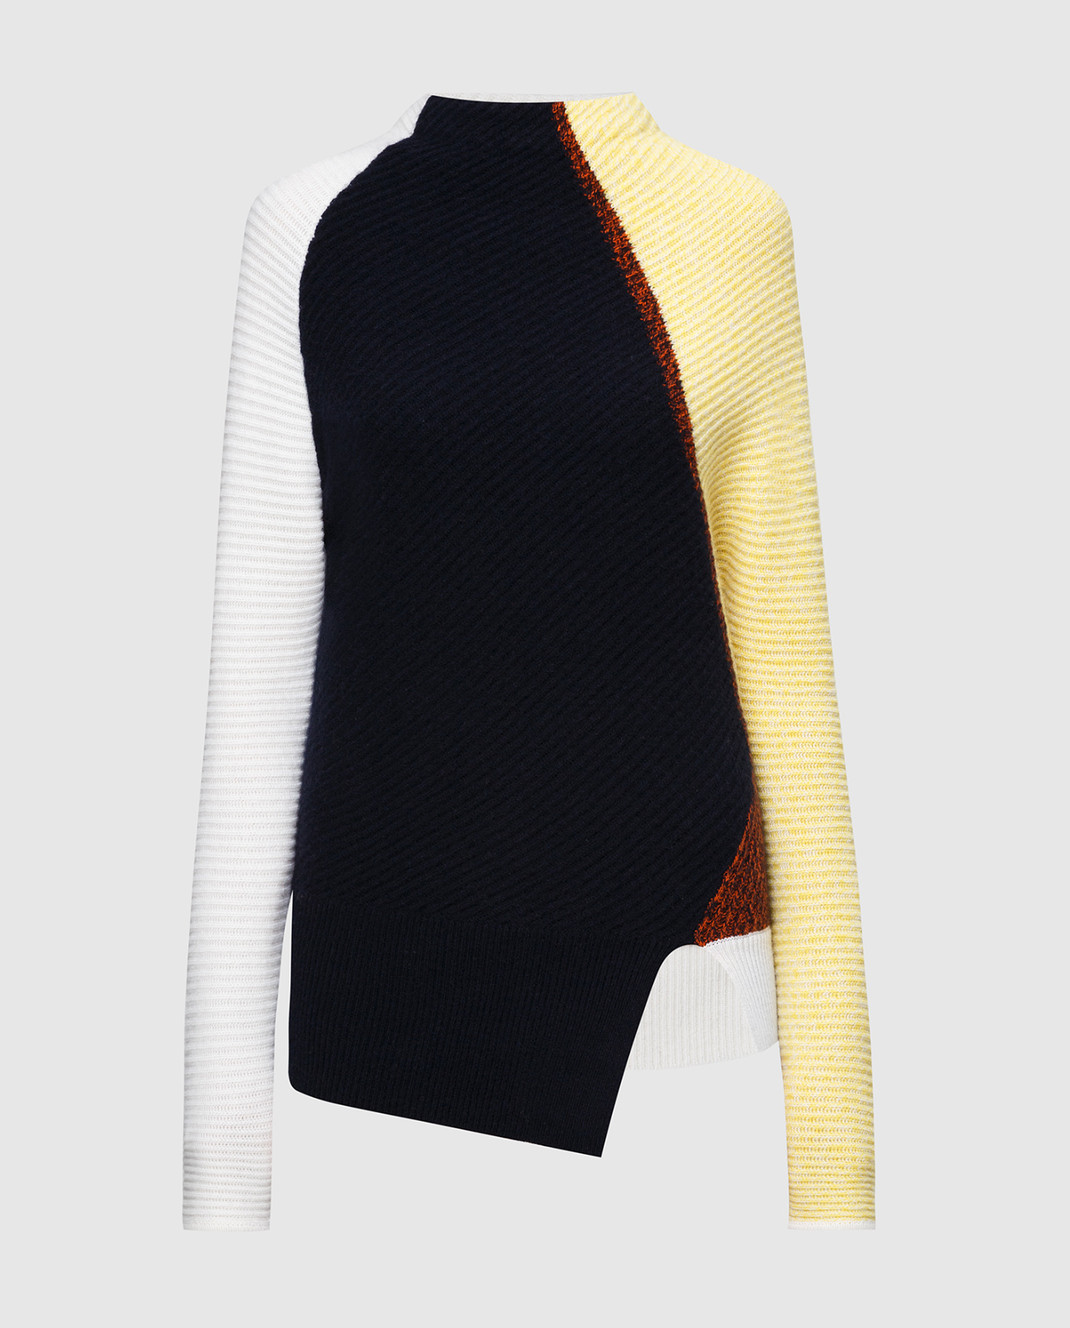 Max Mara Sportmax Темно-синий свитер из кашемира изображение 1